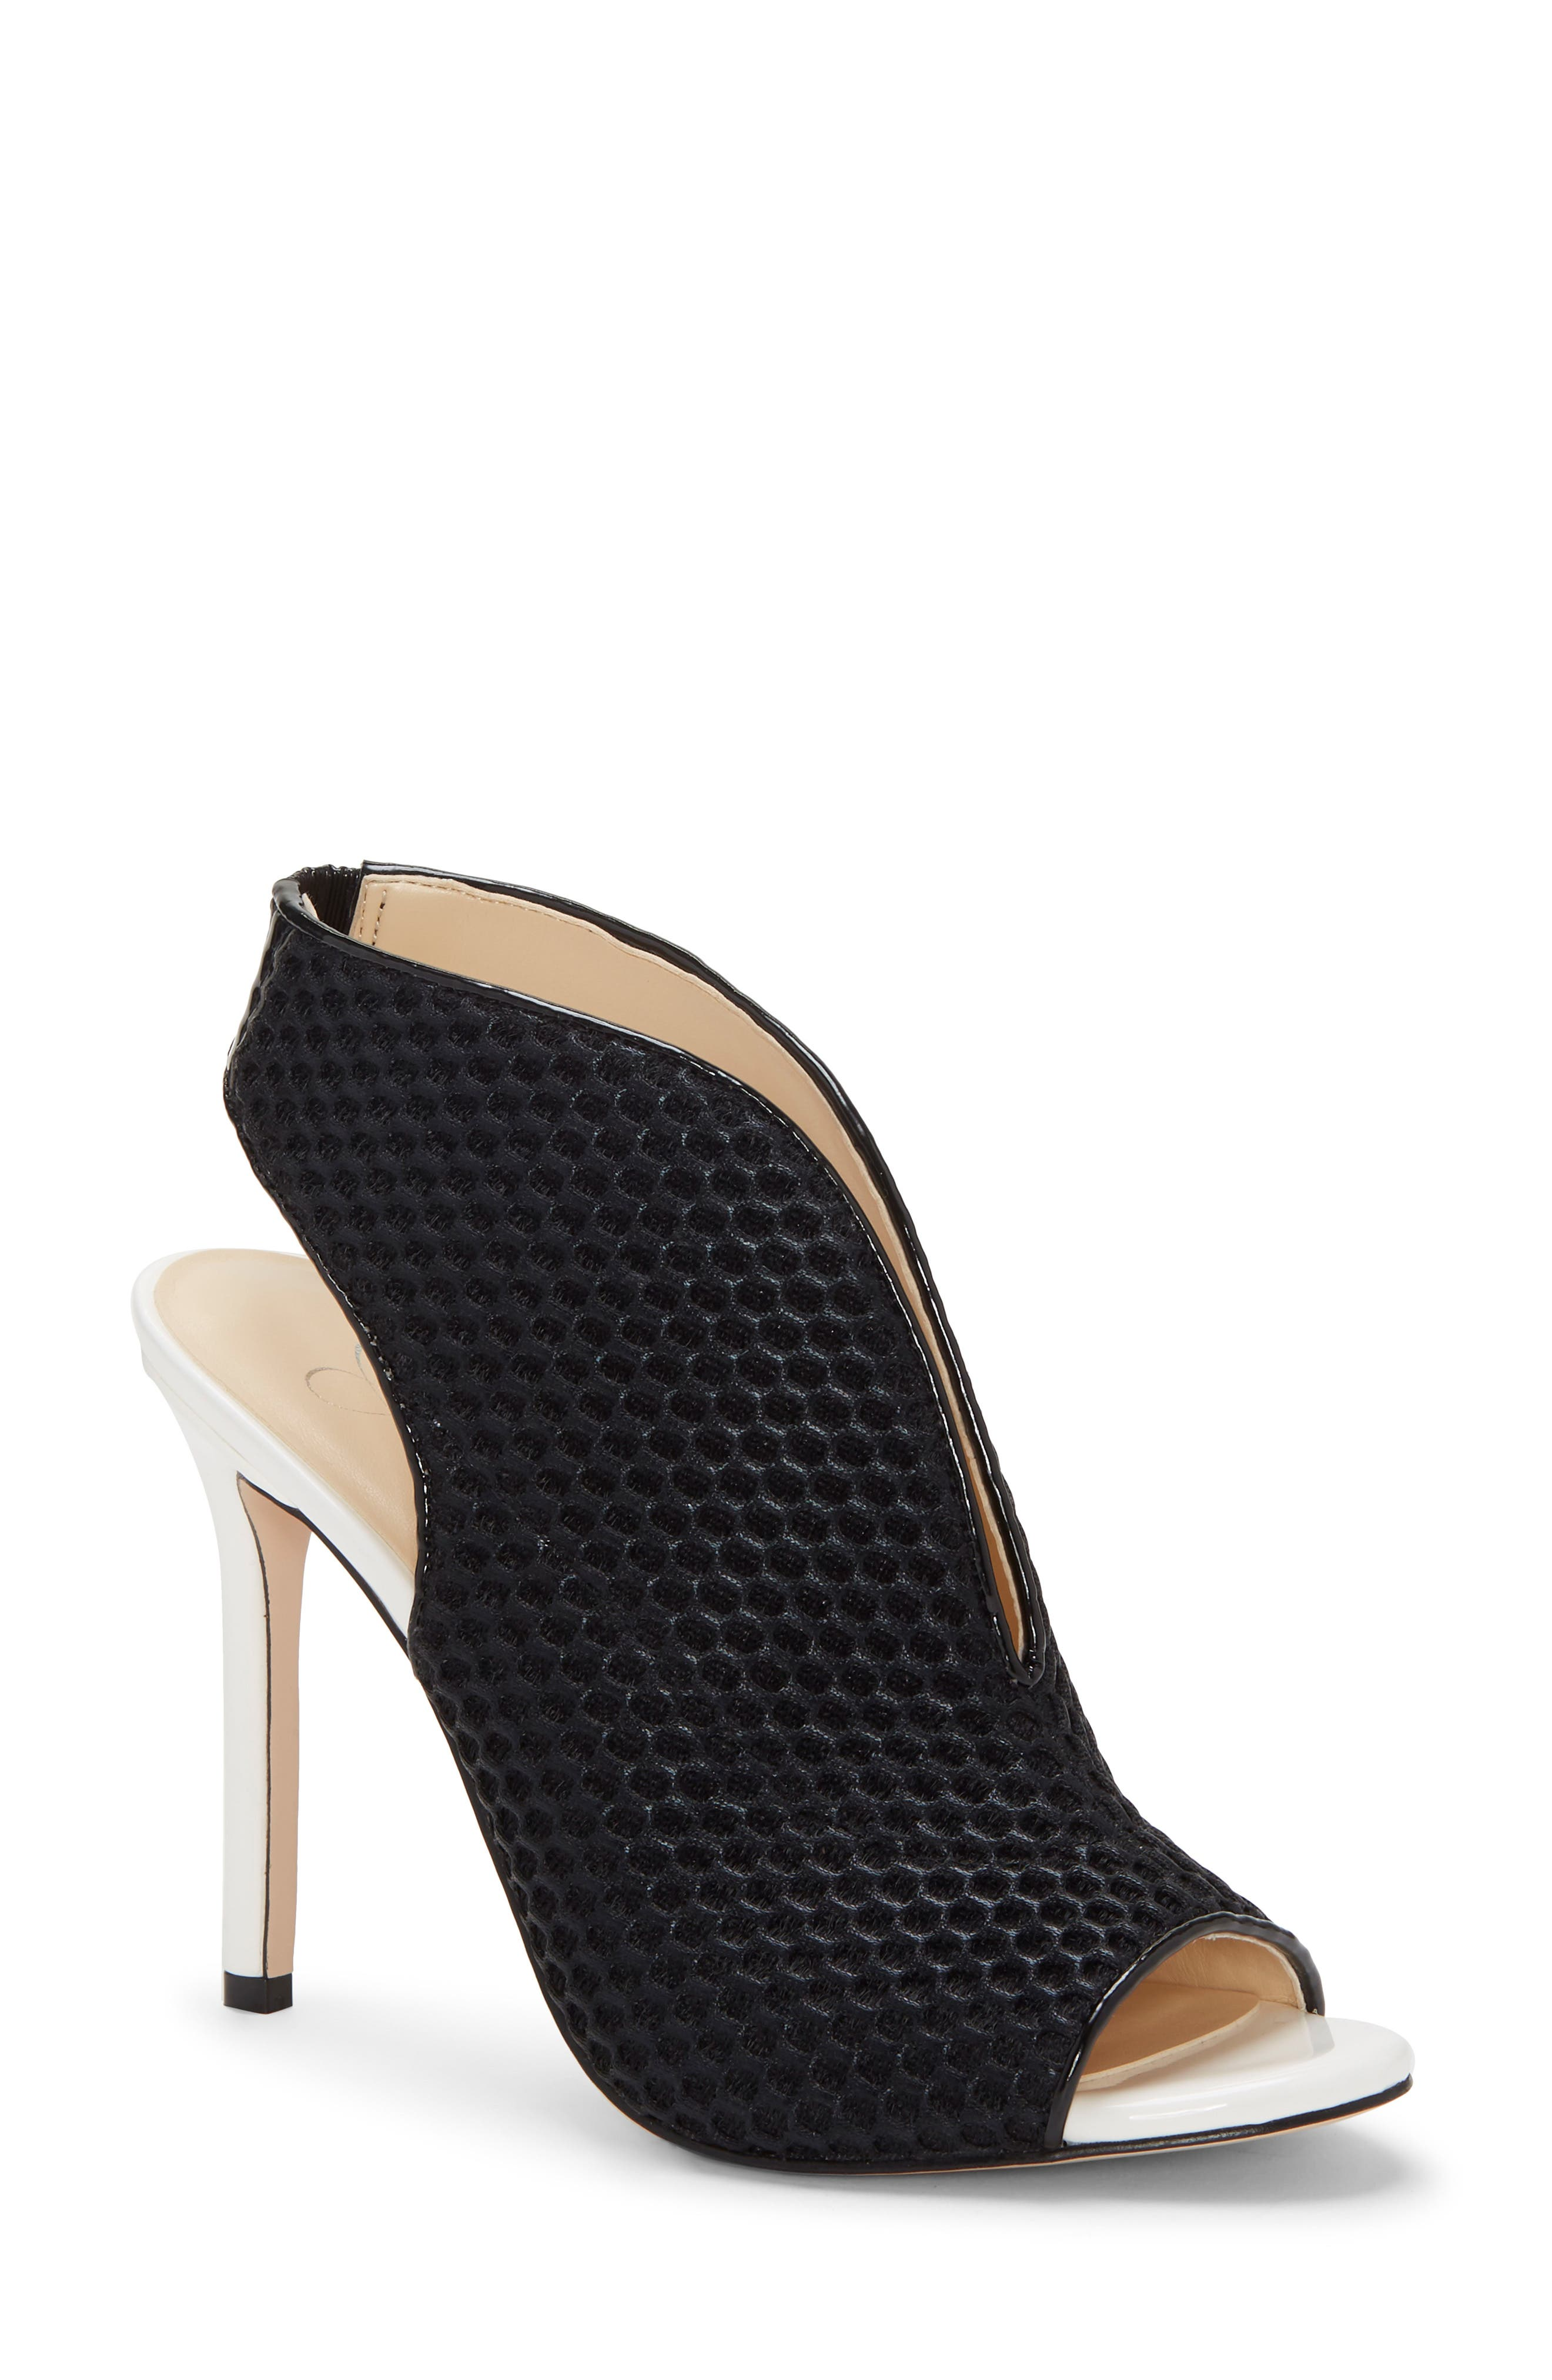 JESSICA SIMPSON Jarvey Sandal, Main, color, BLACK SPORT MESH